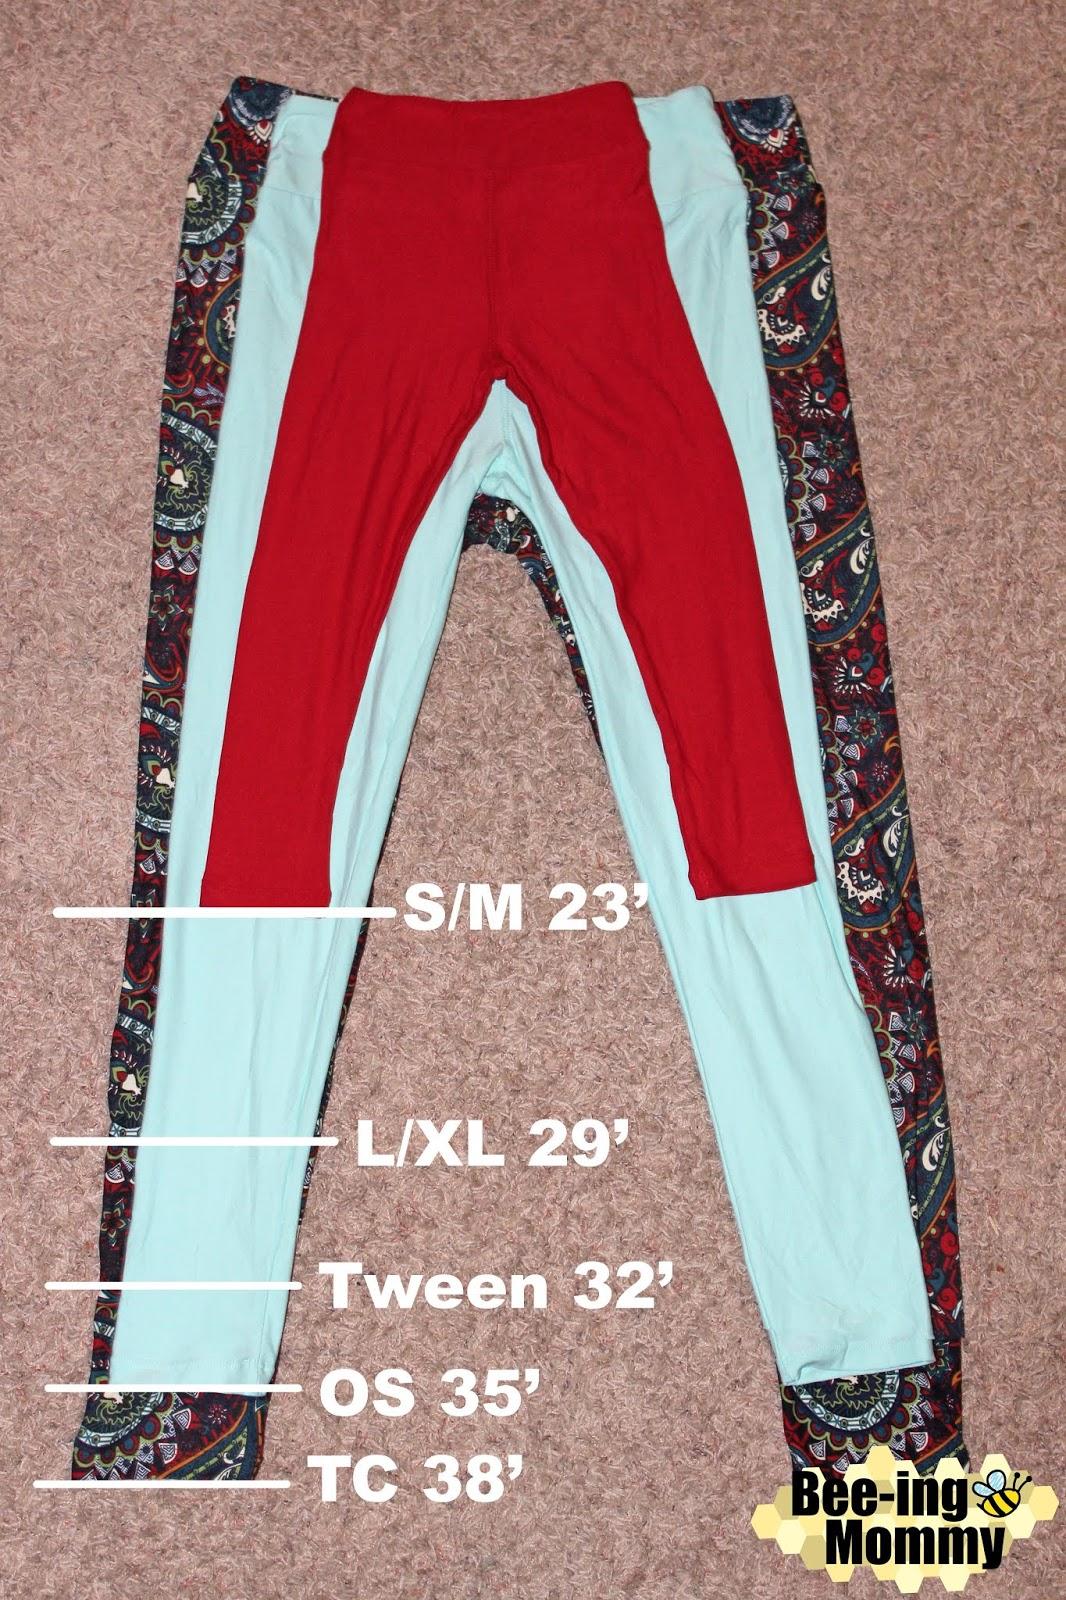 Lularoe Tween Leggings Size Chart : lularoe, tween, leggings, chart, LulaRoe, Leggings, Sizes,, Styling, Tips,, Legging, Hacks,